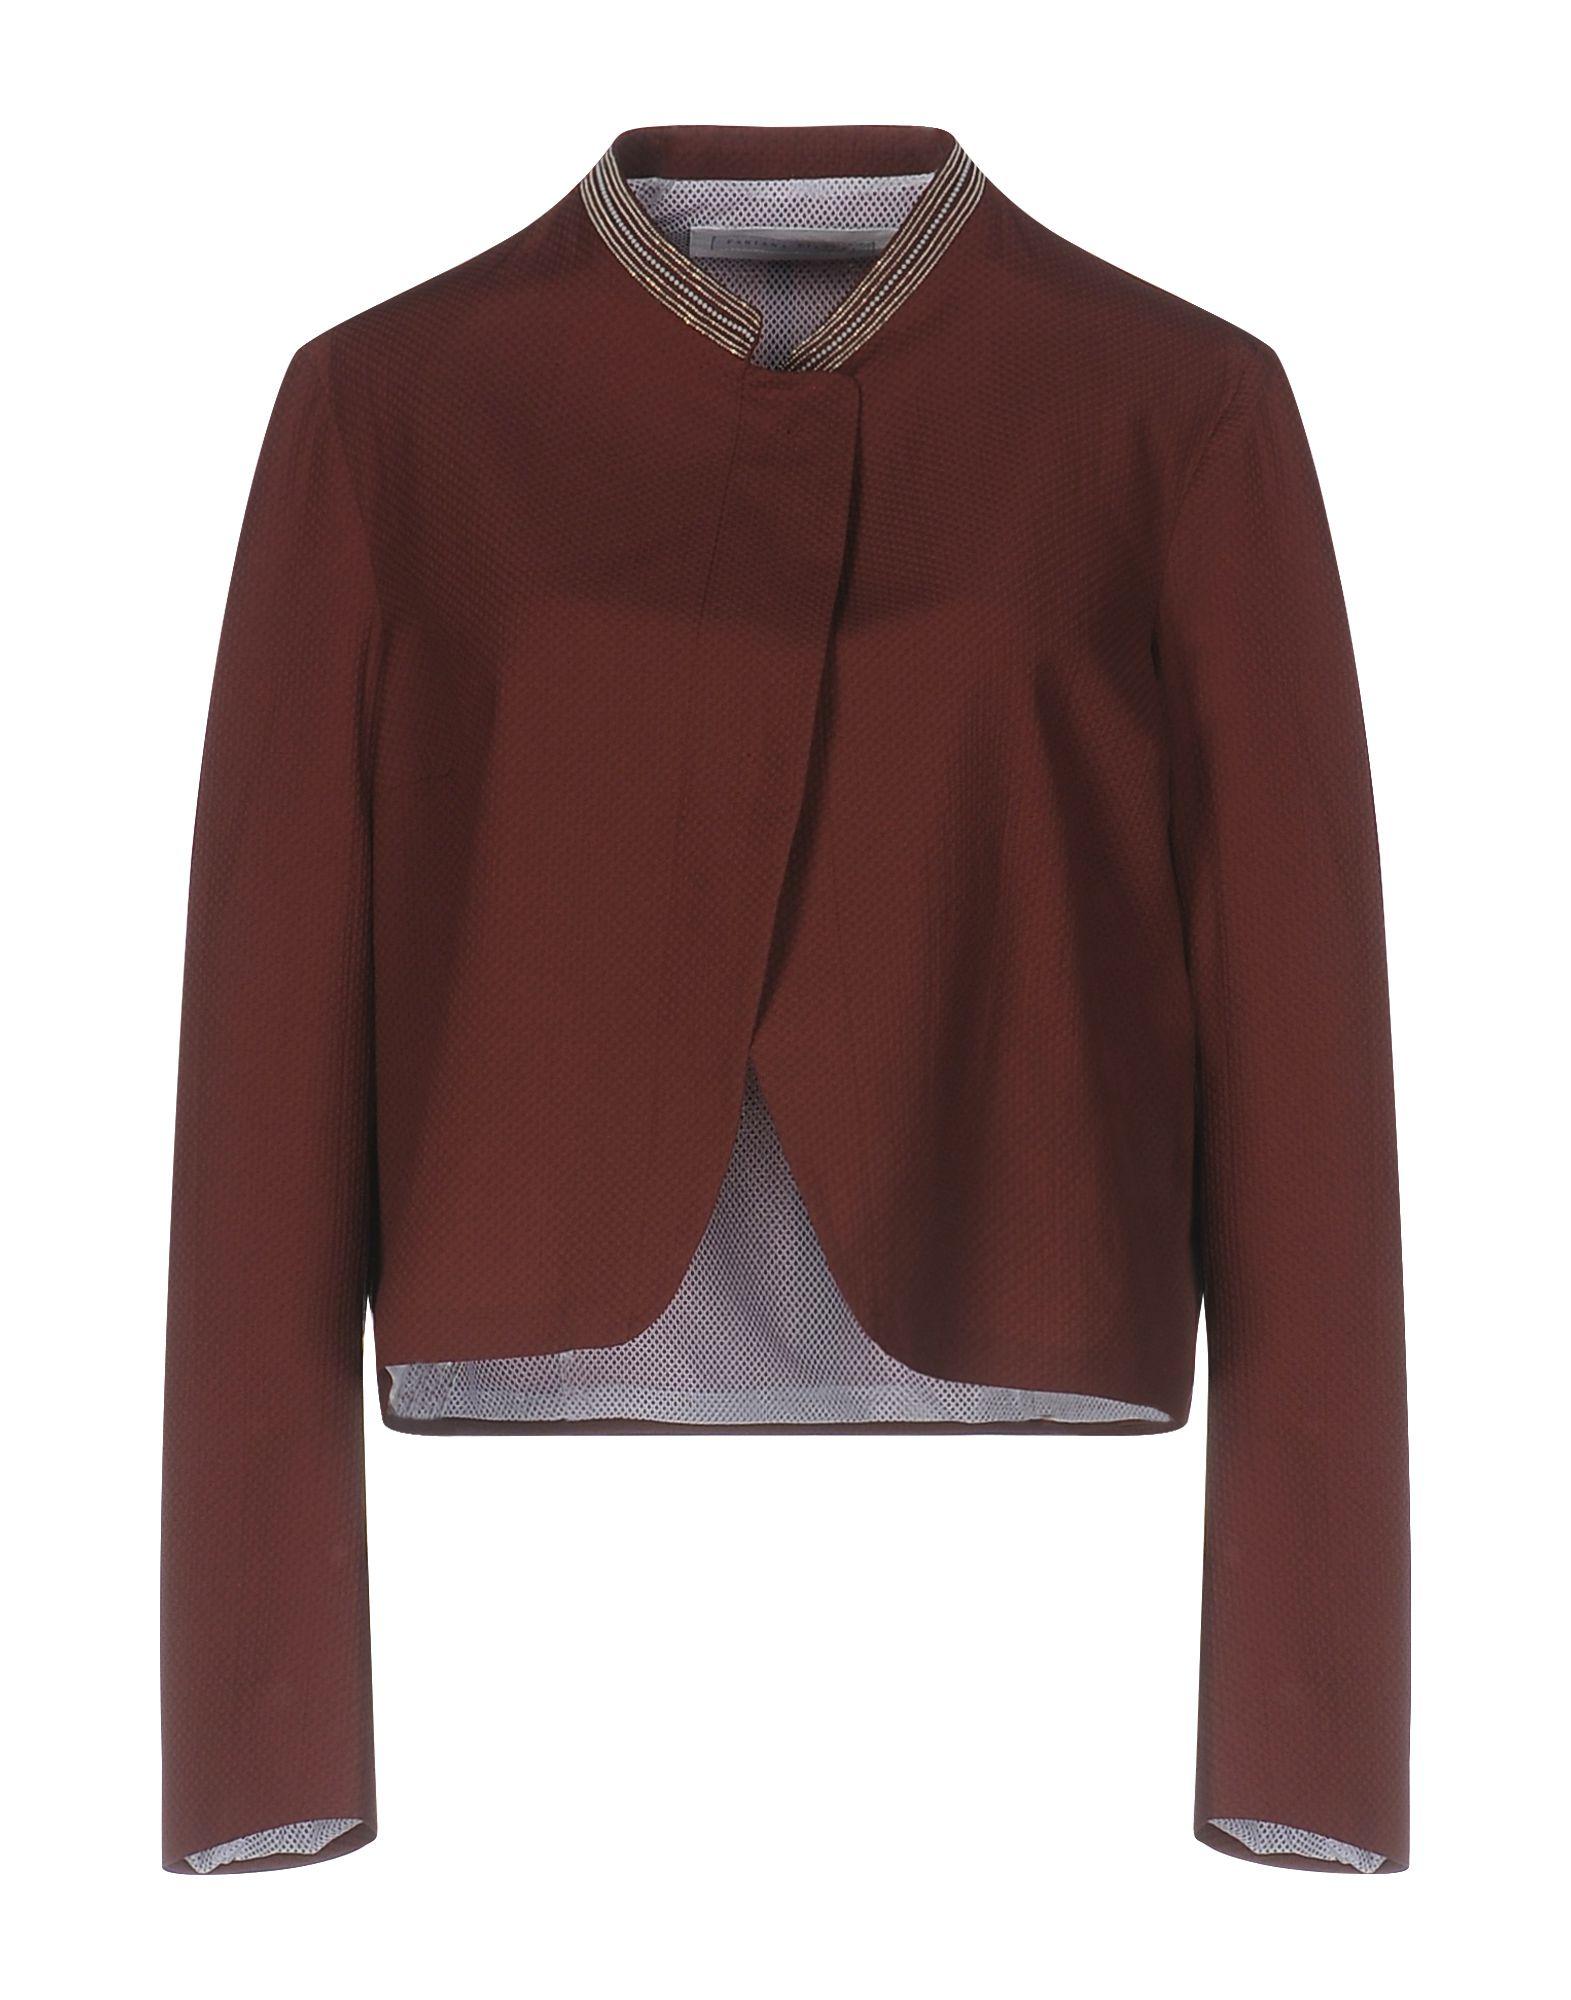 FABIANA FILIPPI Damen Jackett Farbe Braun Größe 7 jetztbilligerkaufen